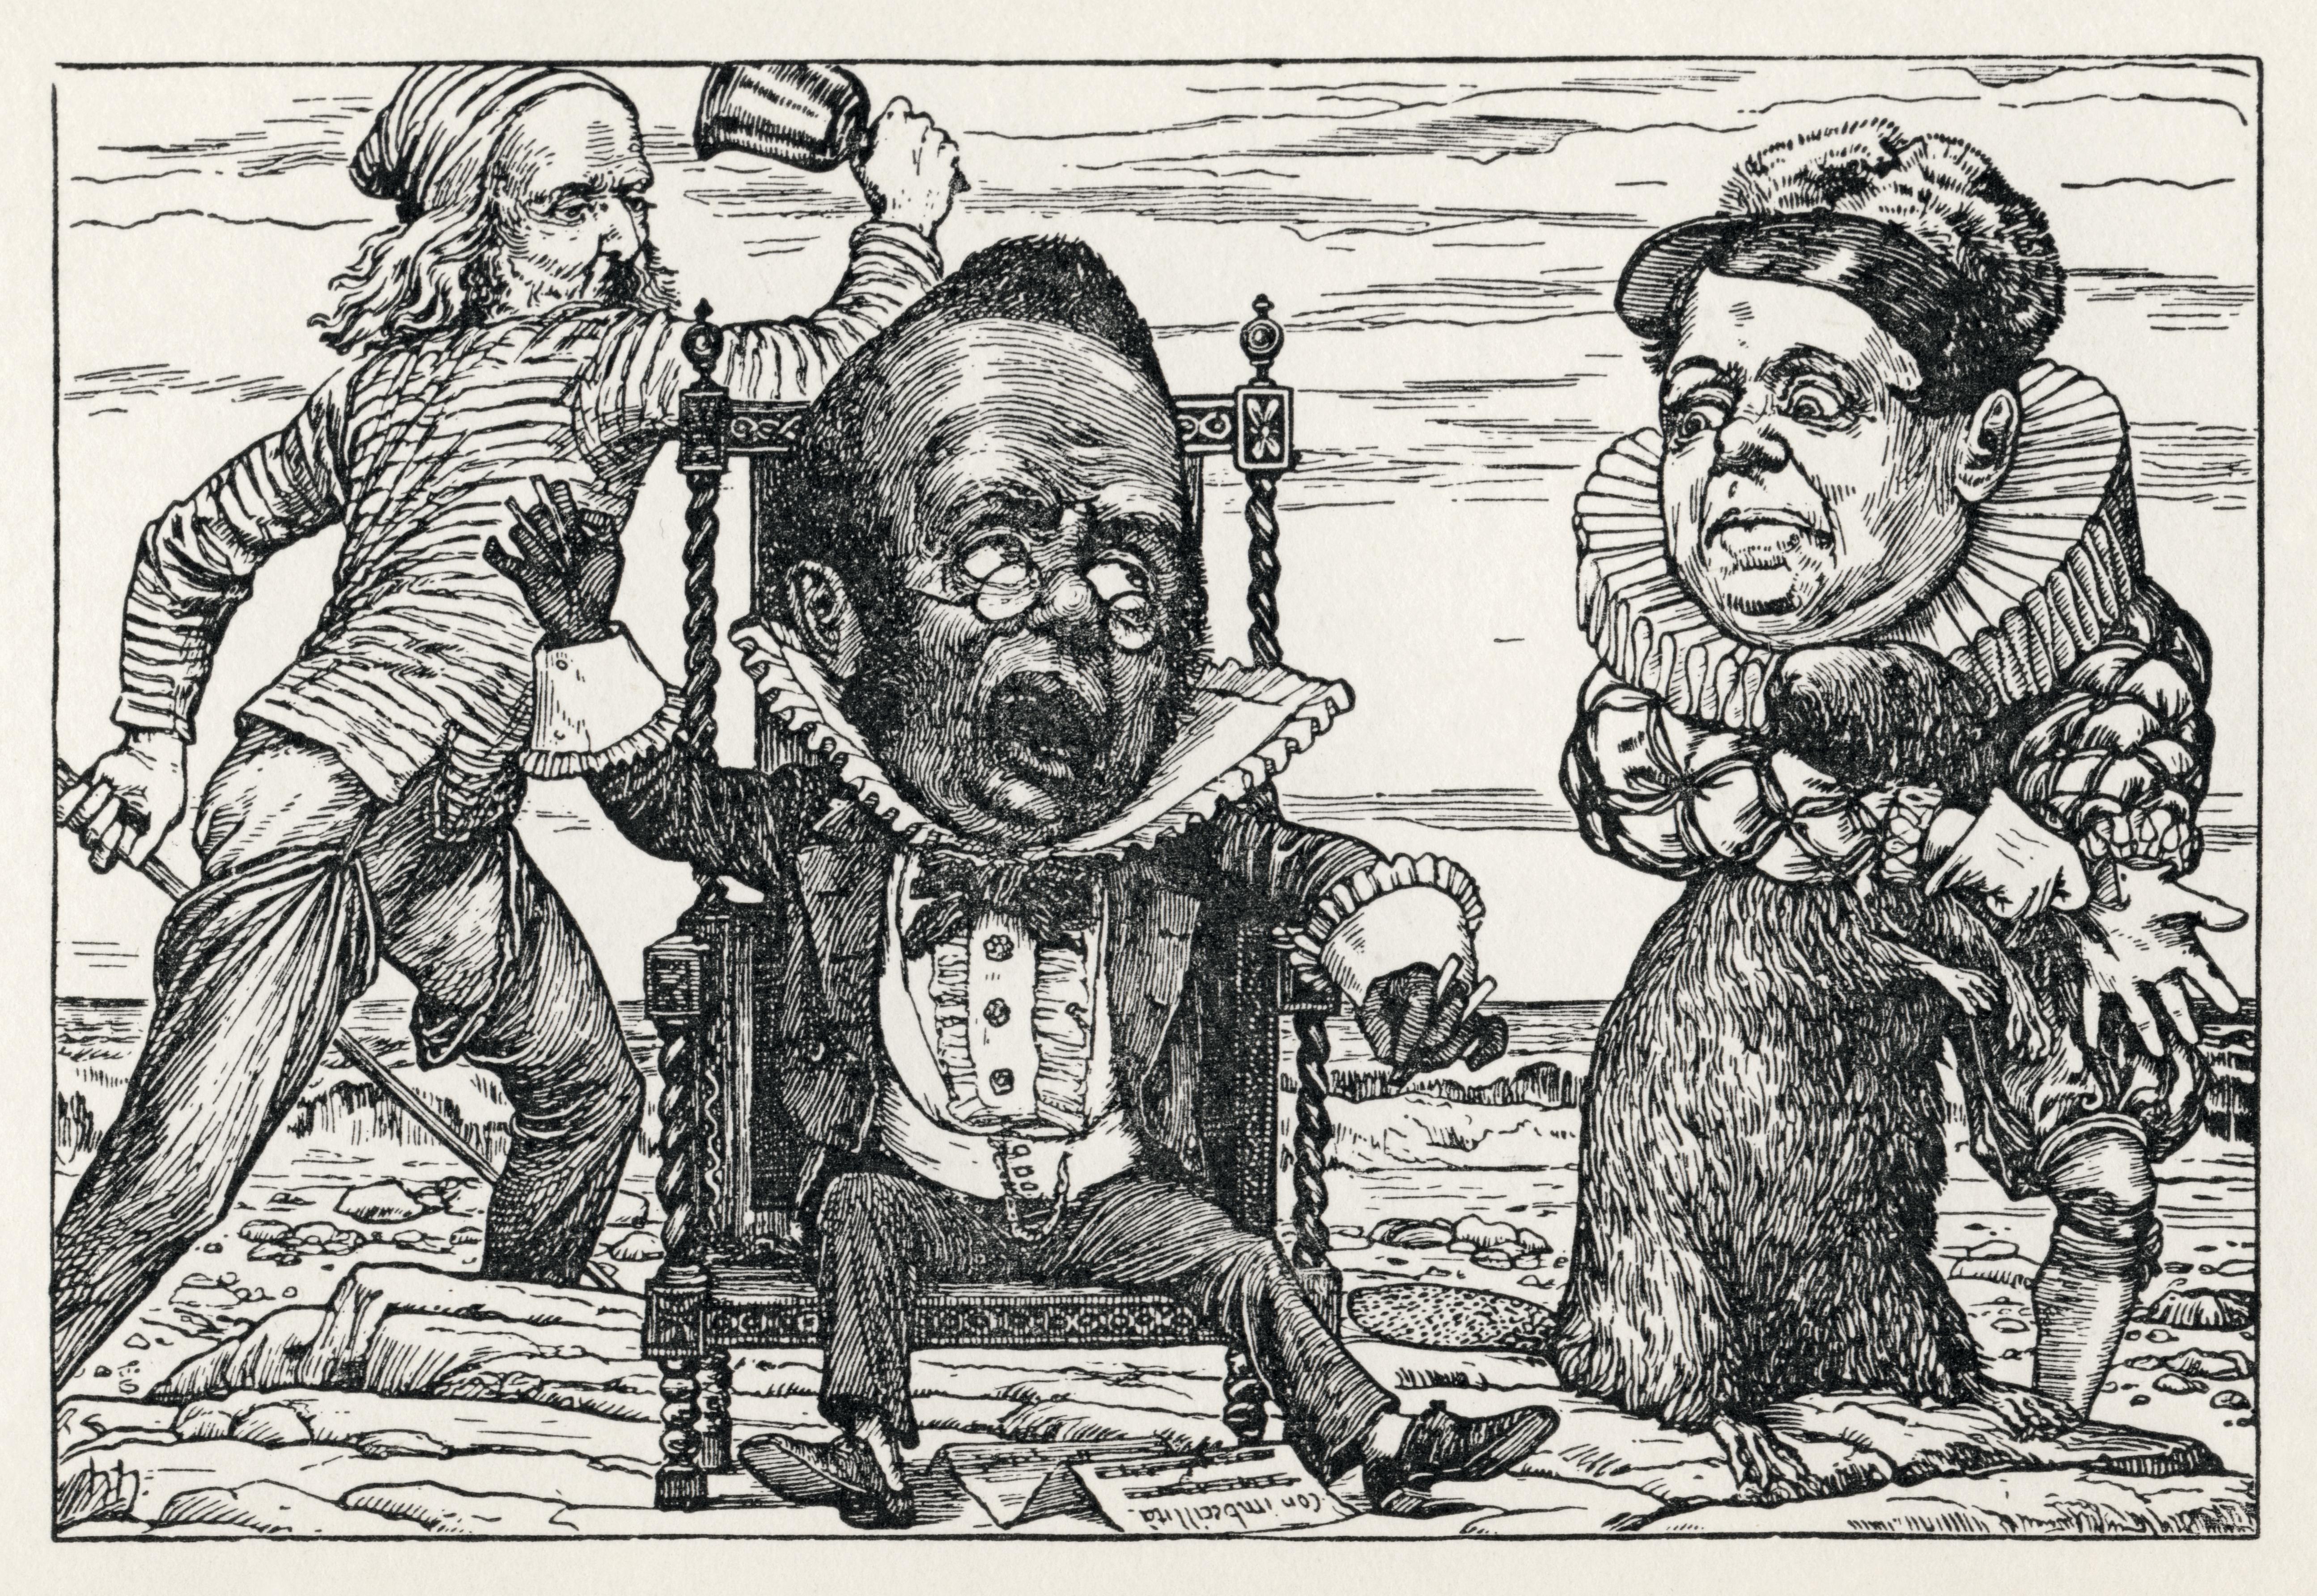 symbolism poem walrus and carpenter